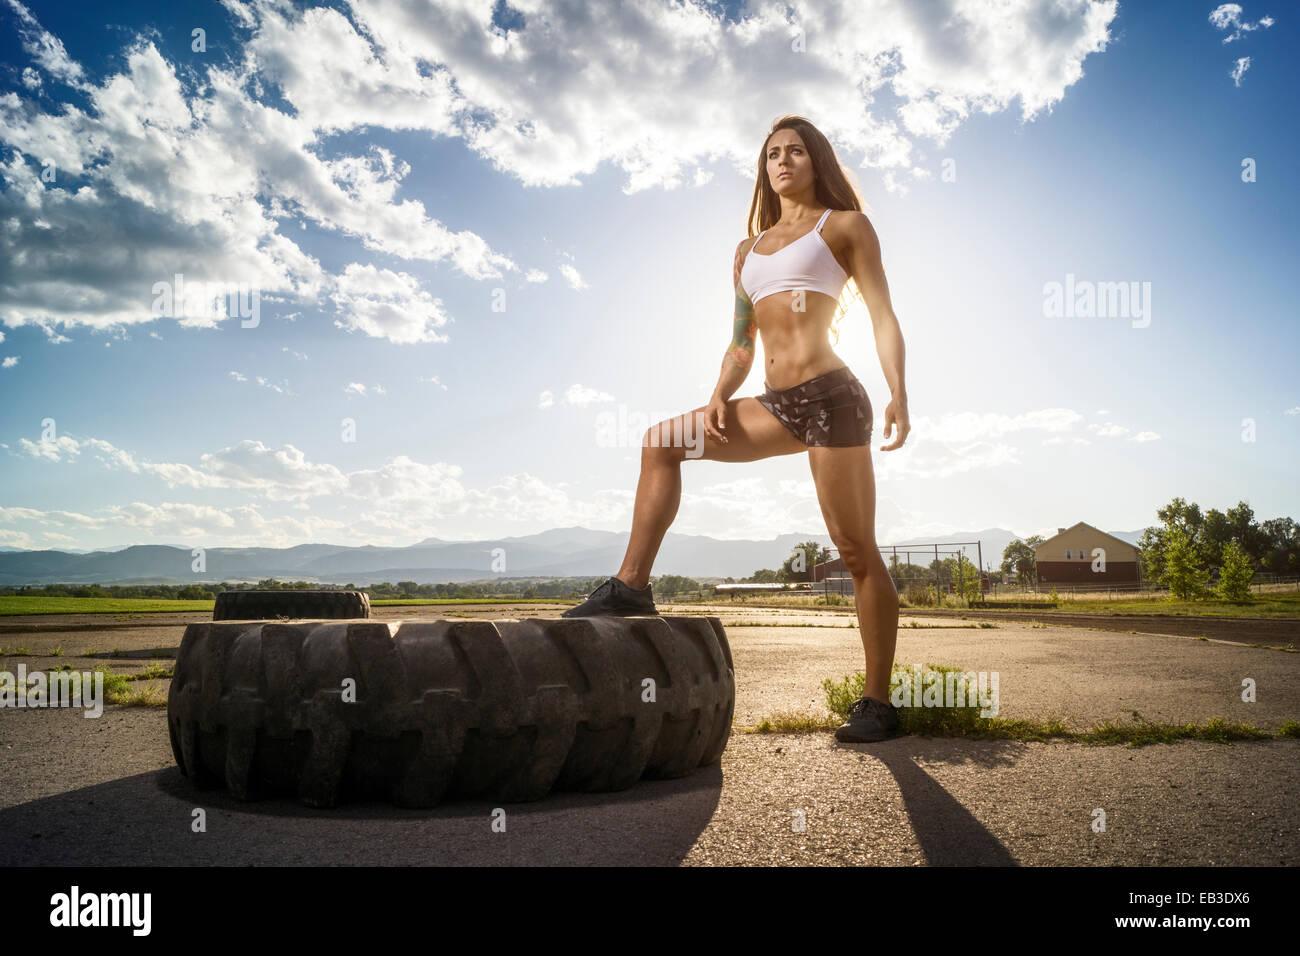 USA, Colorado, Jefferson County, Arvada, Female athlete posing with track tire - Stock Image